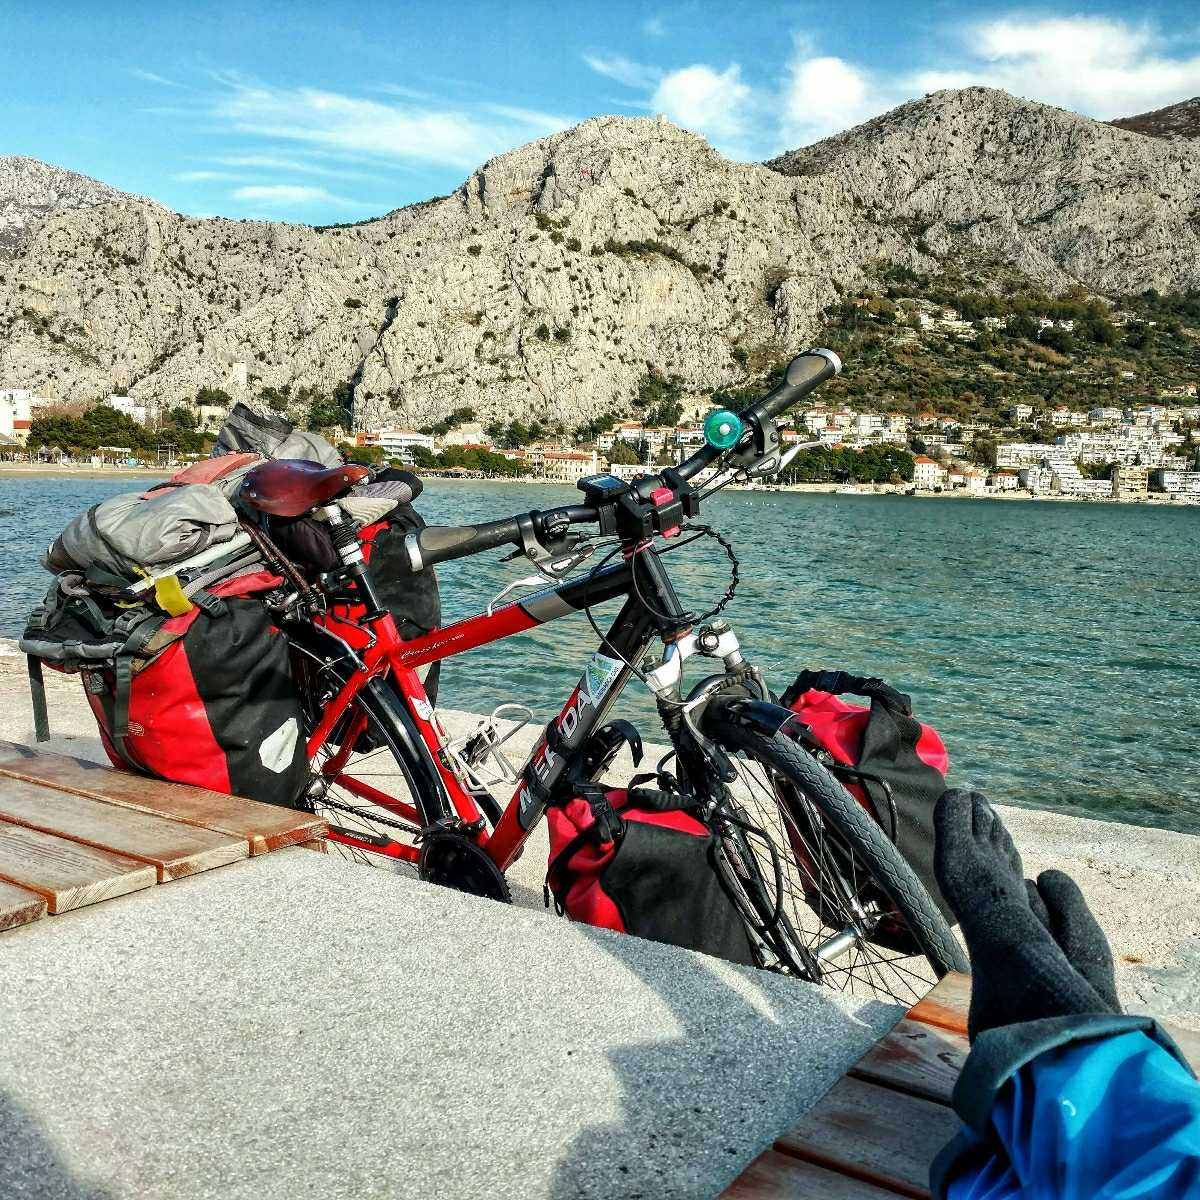 Looking back on November, biking the Croatian coast - Omiš